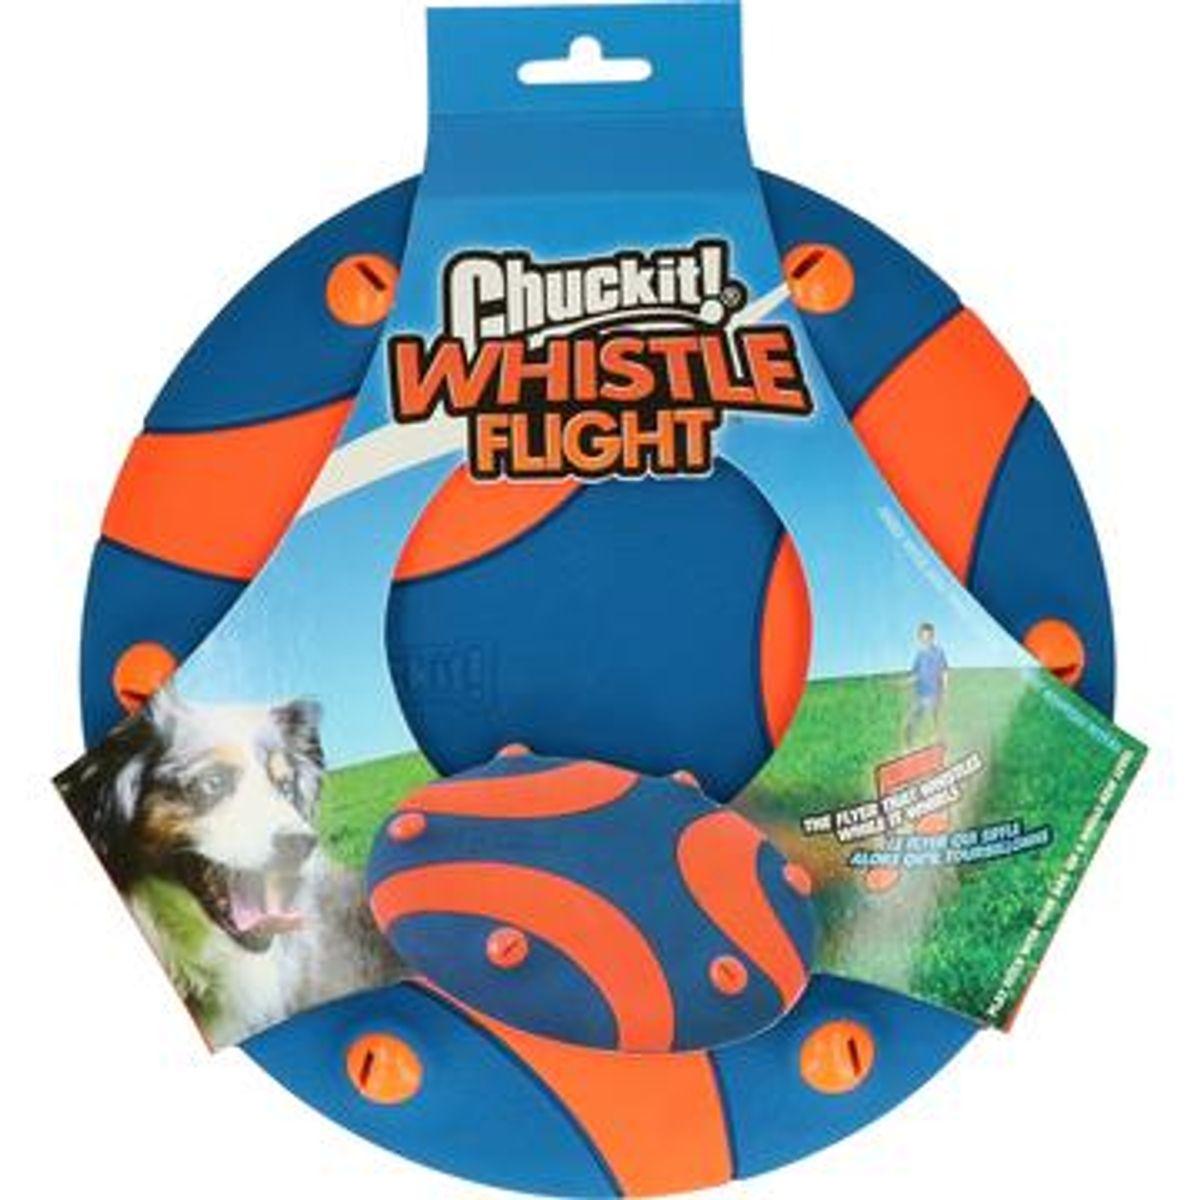 Hundeleke Frisbee Chuckit! Whistle Flight